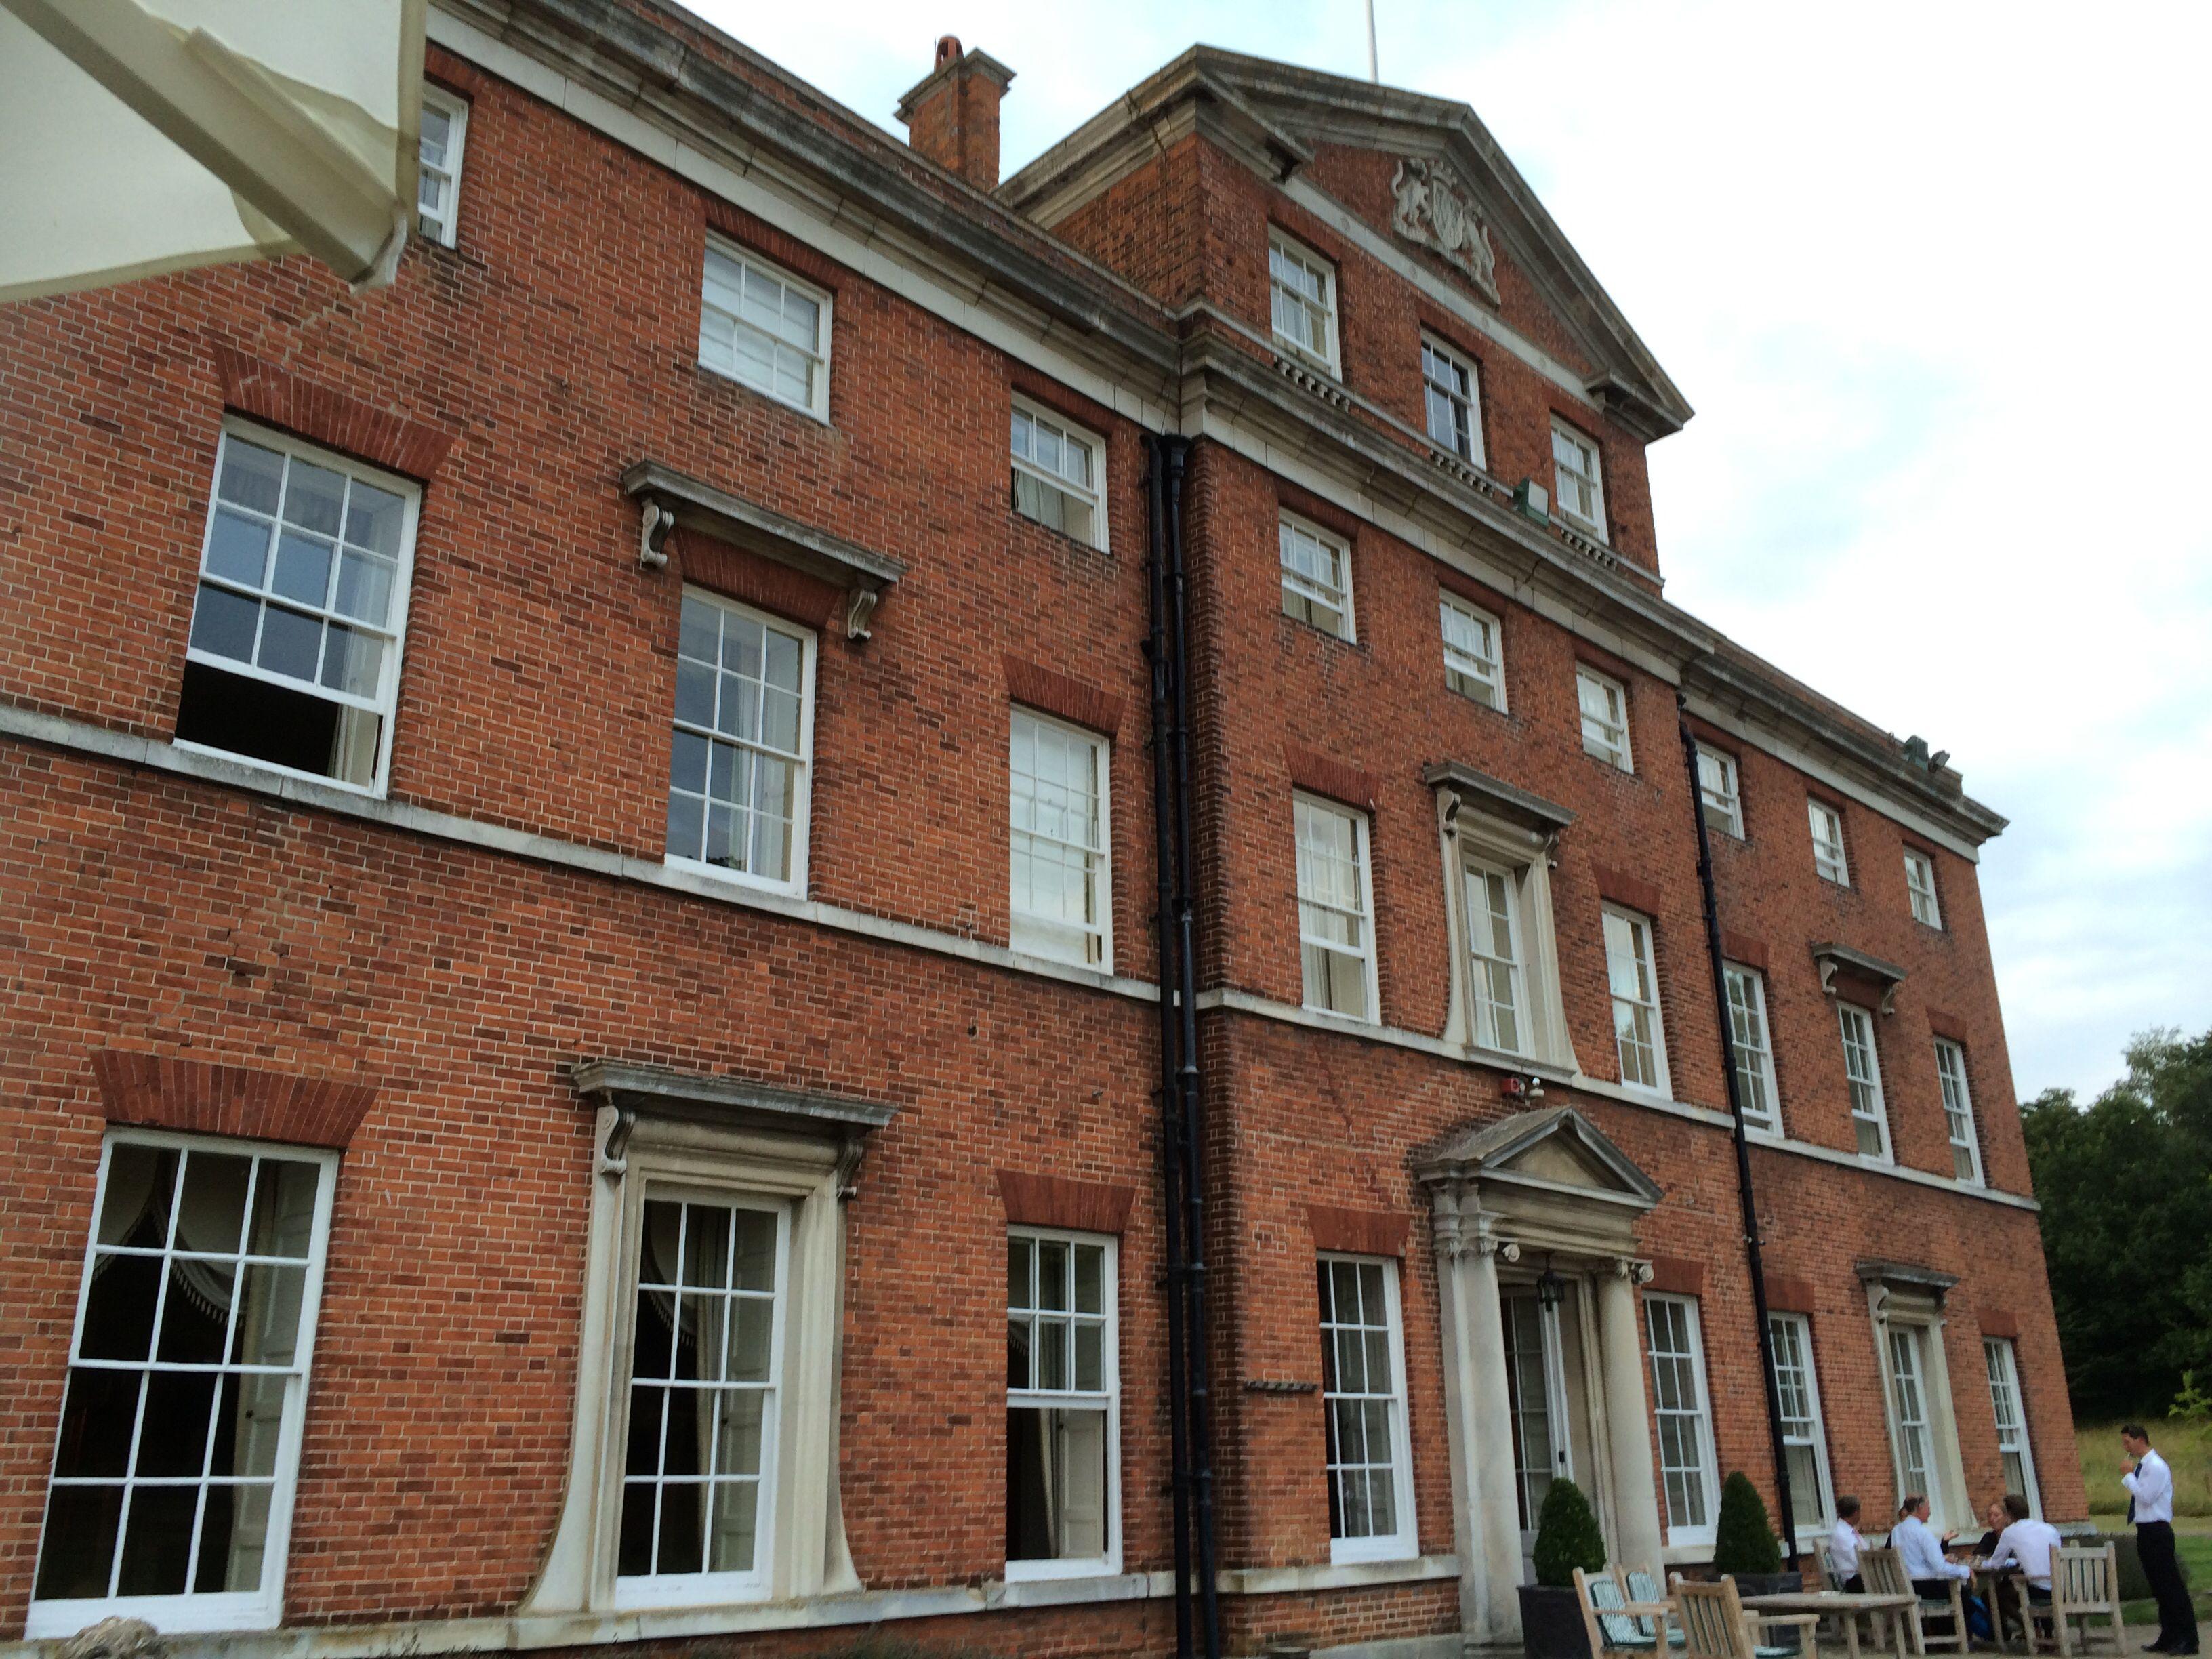 Brocket Hall, Welwyn Garden City, Hertfordshire | En Halls, Palaces ...